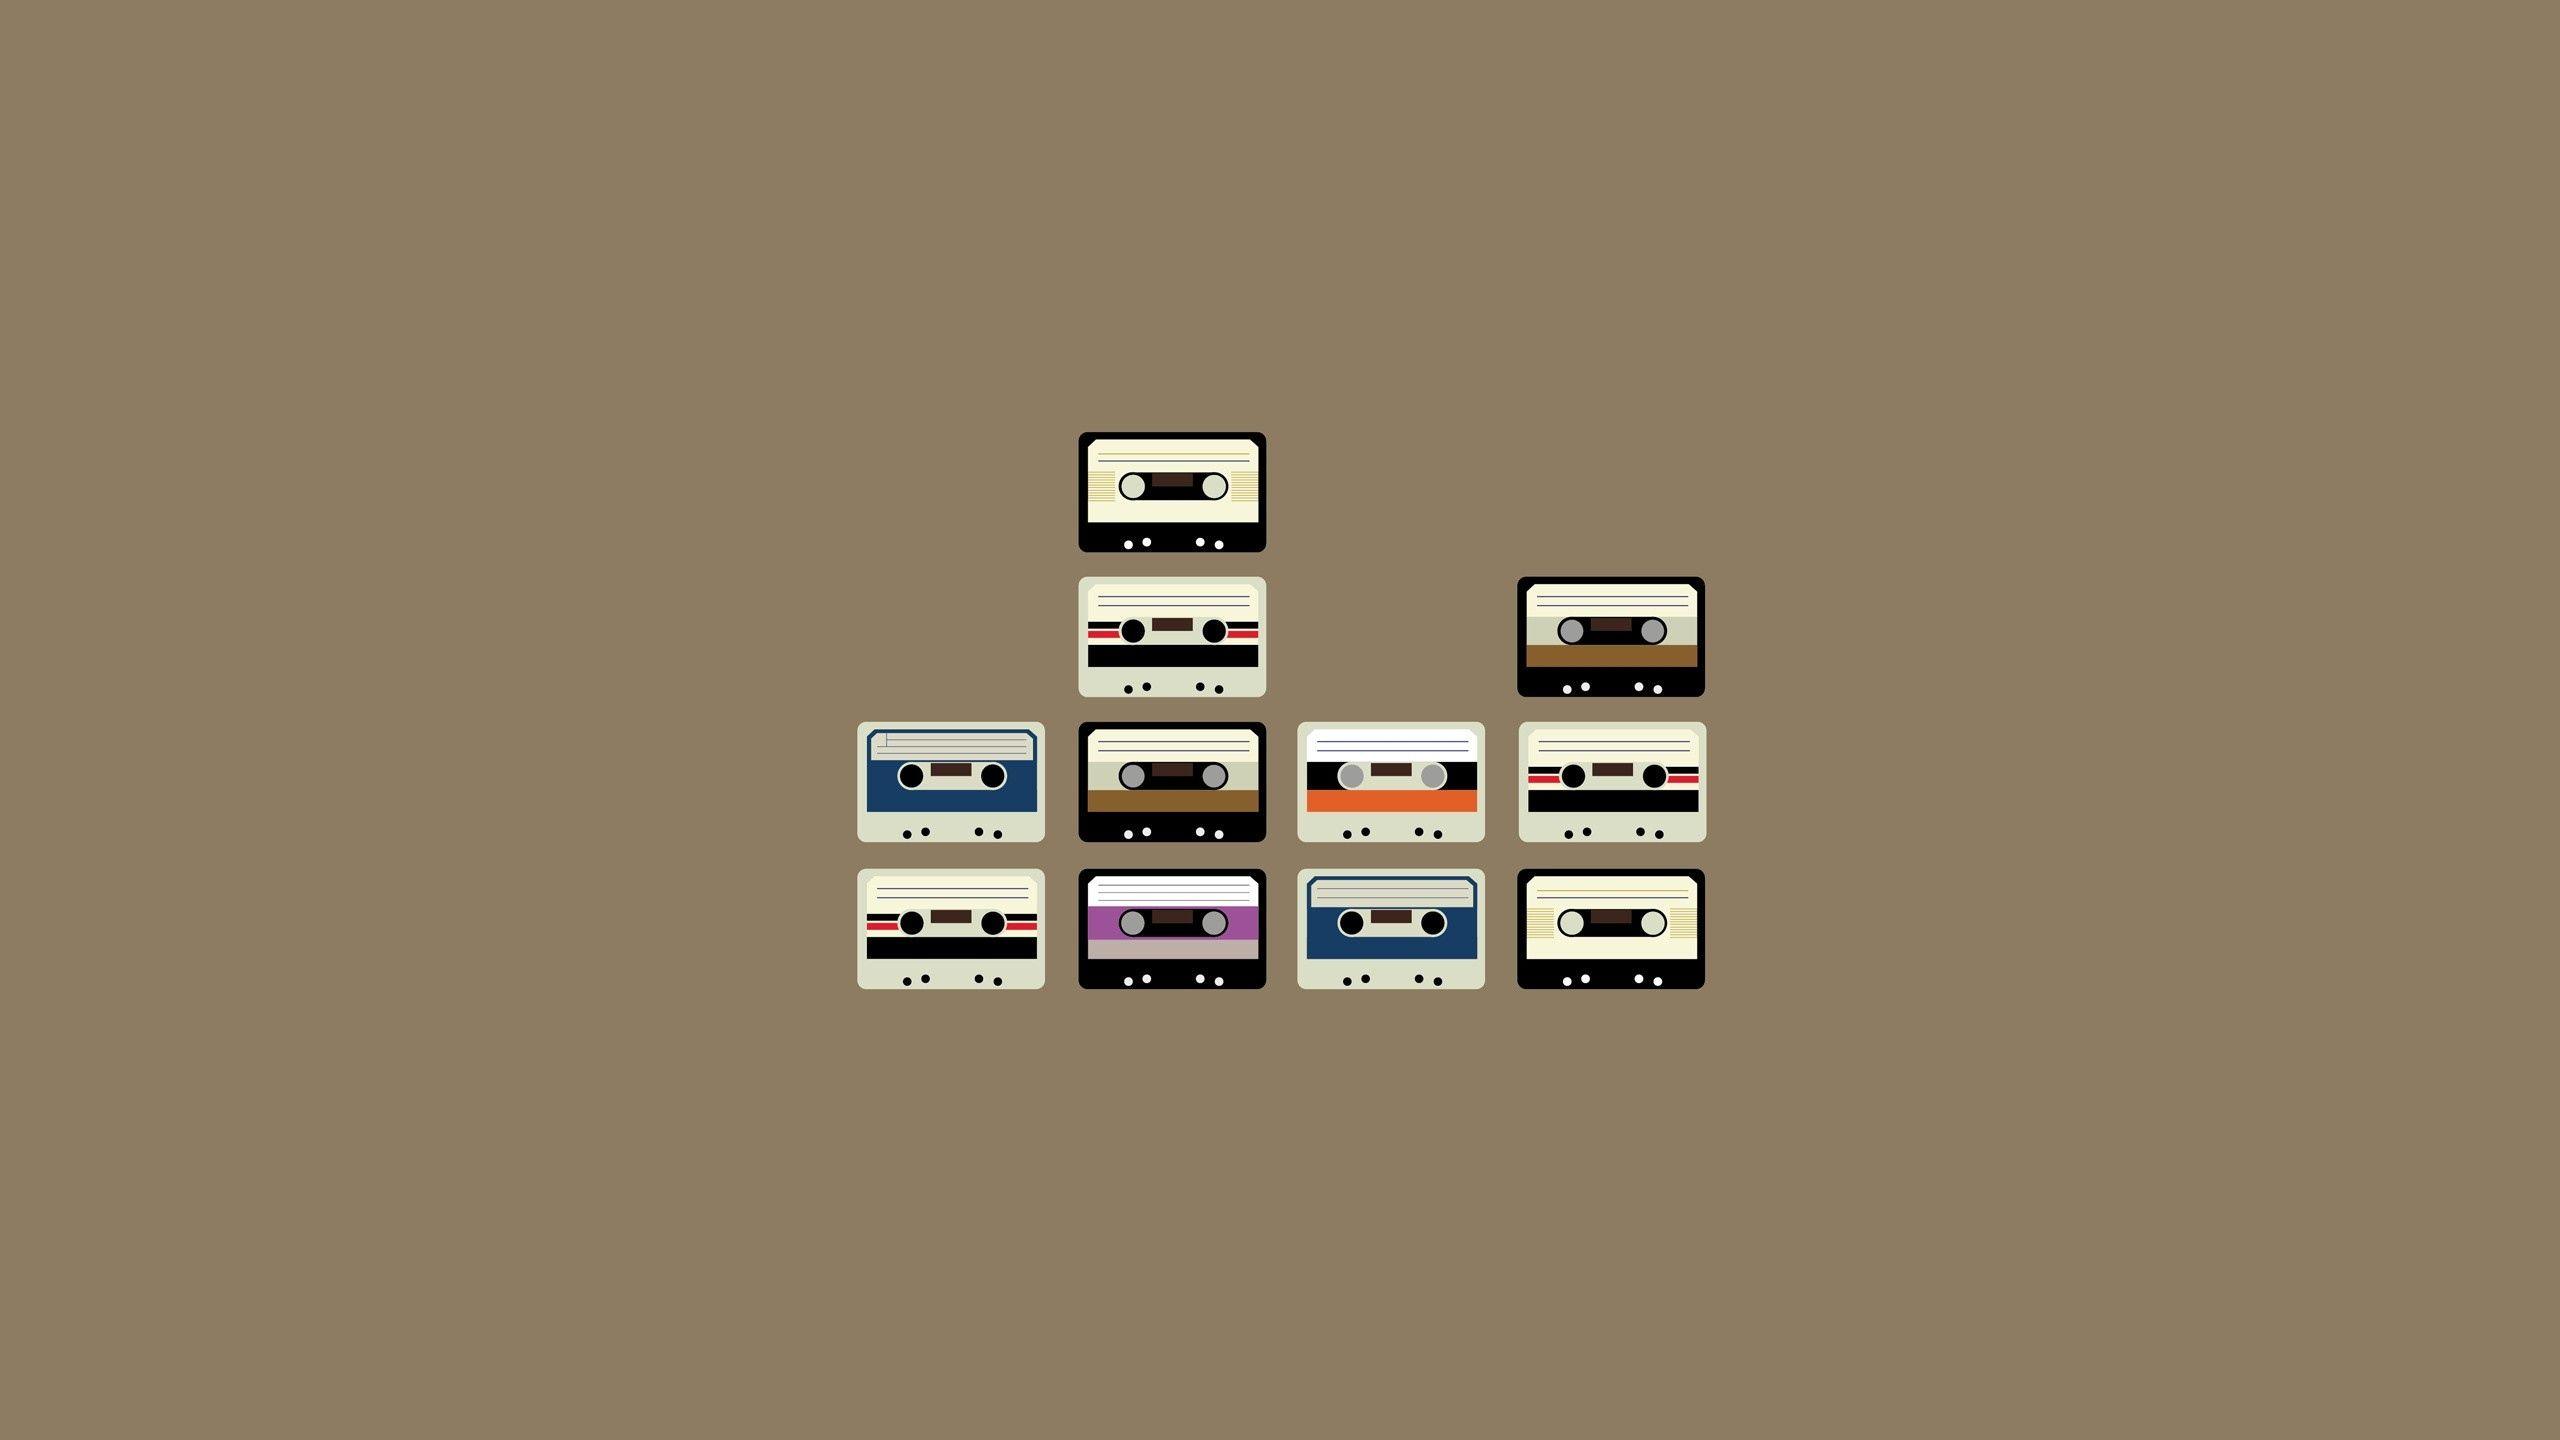 2560x1440 Wallpaper Cassette Set Retro Desktop Wallpaper Art Minimalist Wallpaper Minimalist Desktop Wallpaper